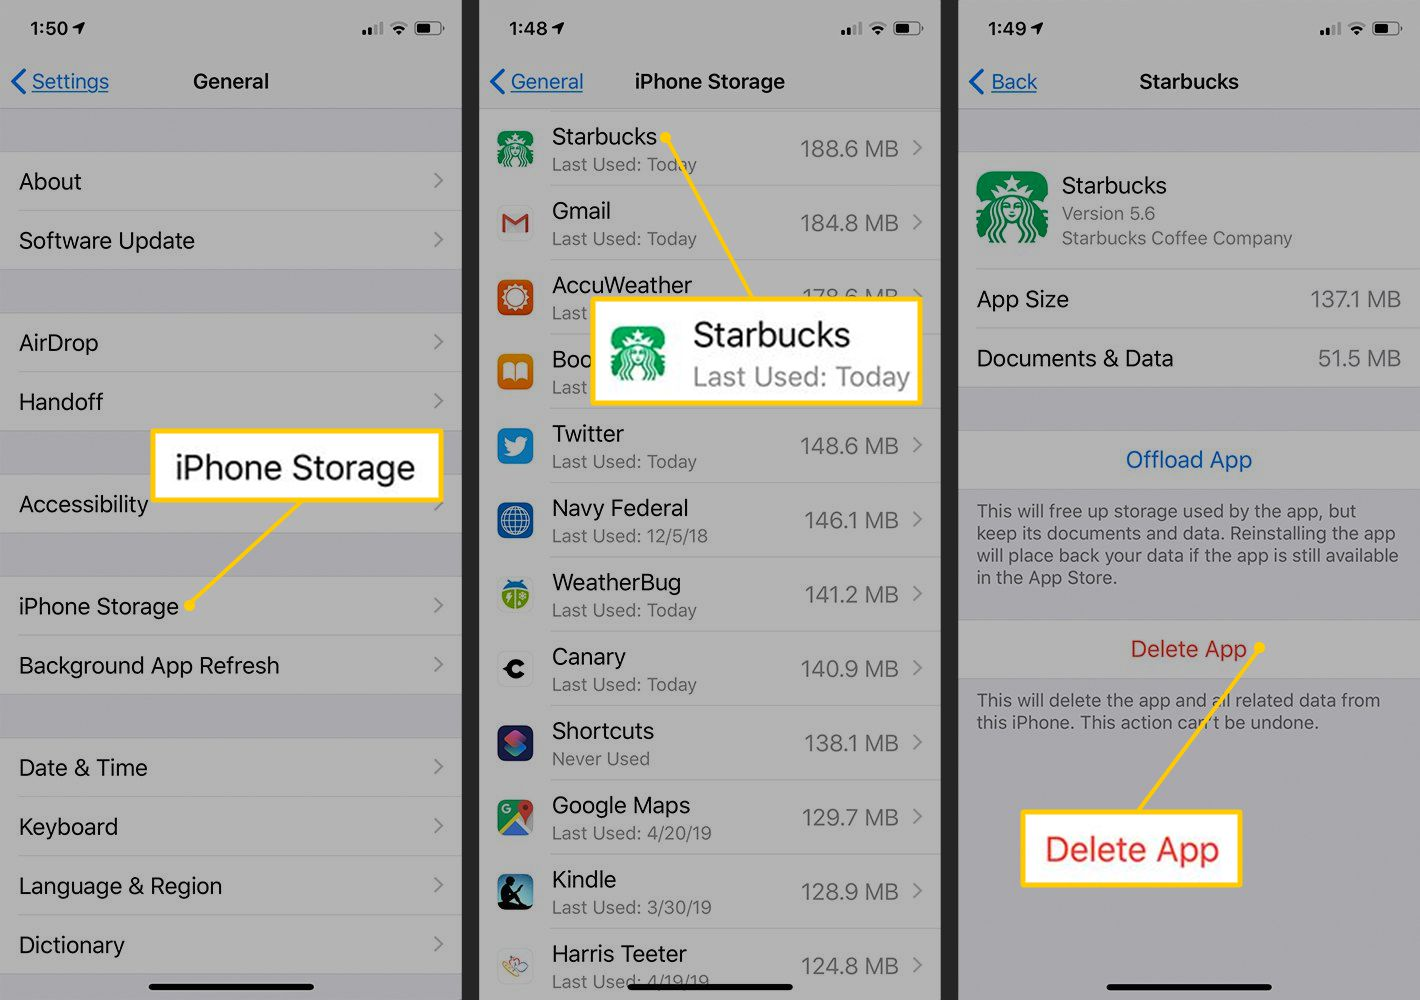 iPhone Storage, Starbucks App, Delete App buttons in iOS Settings